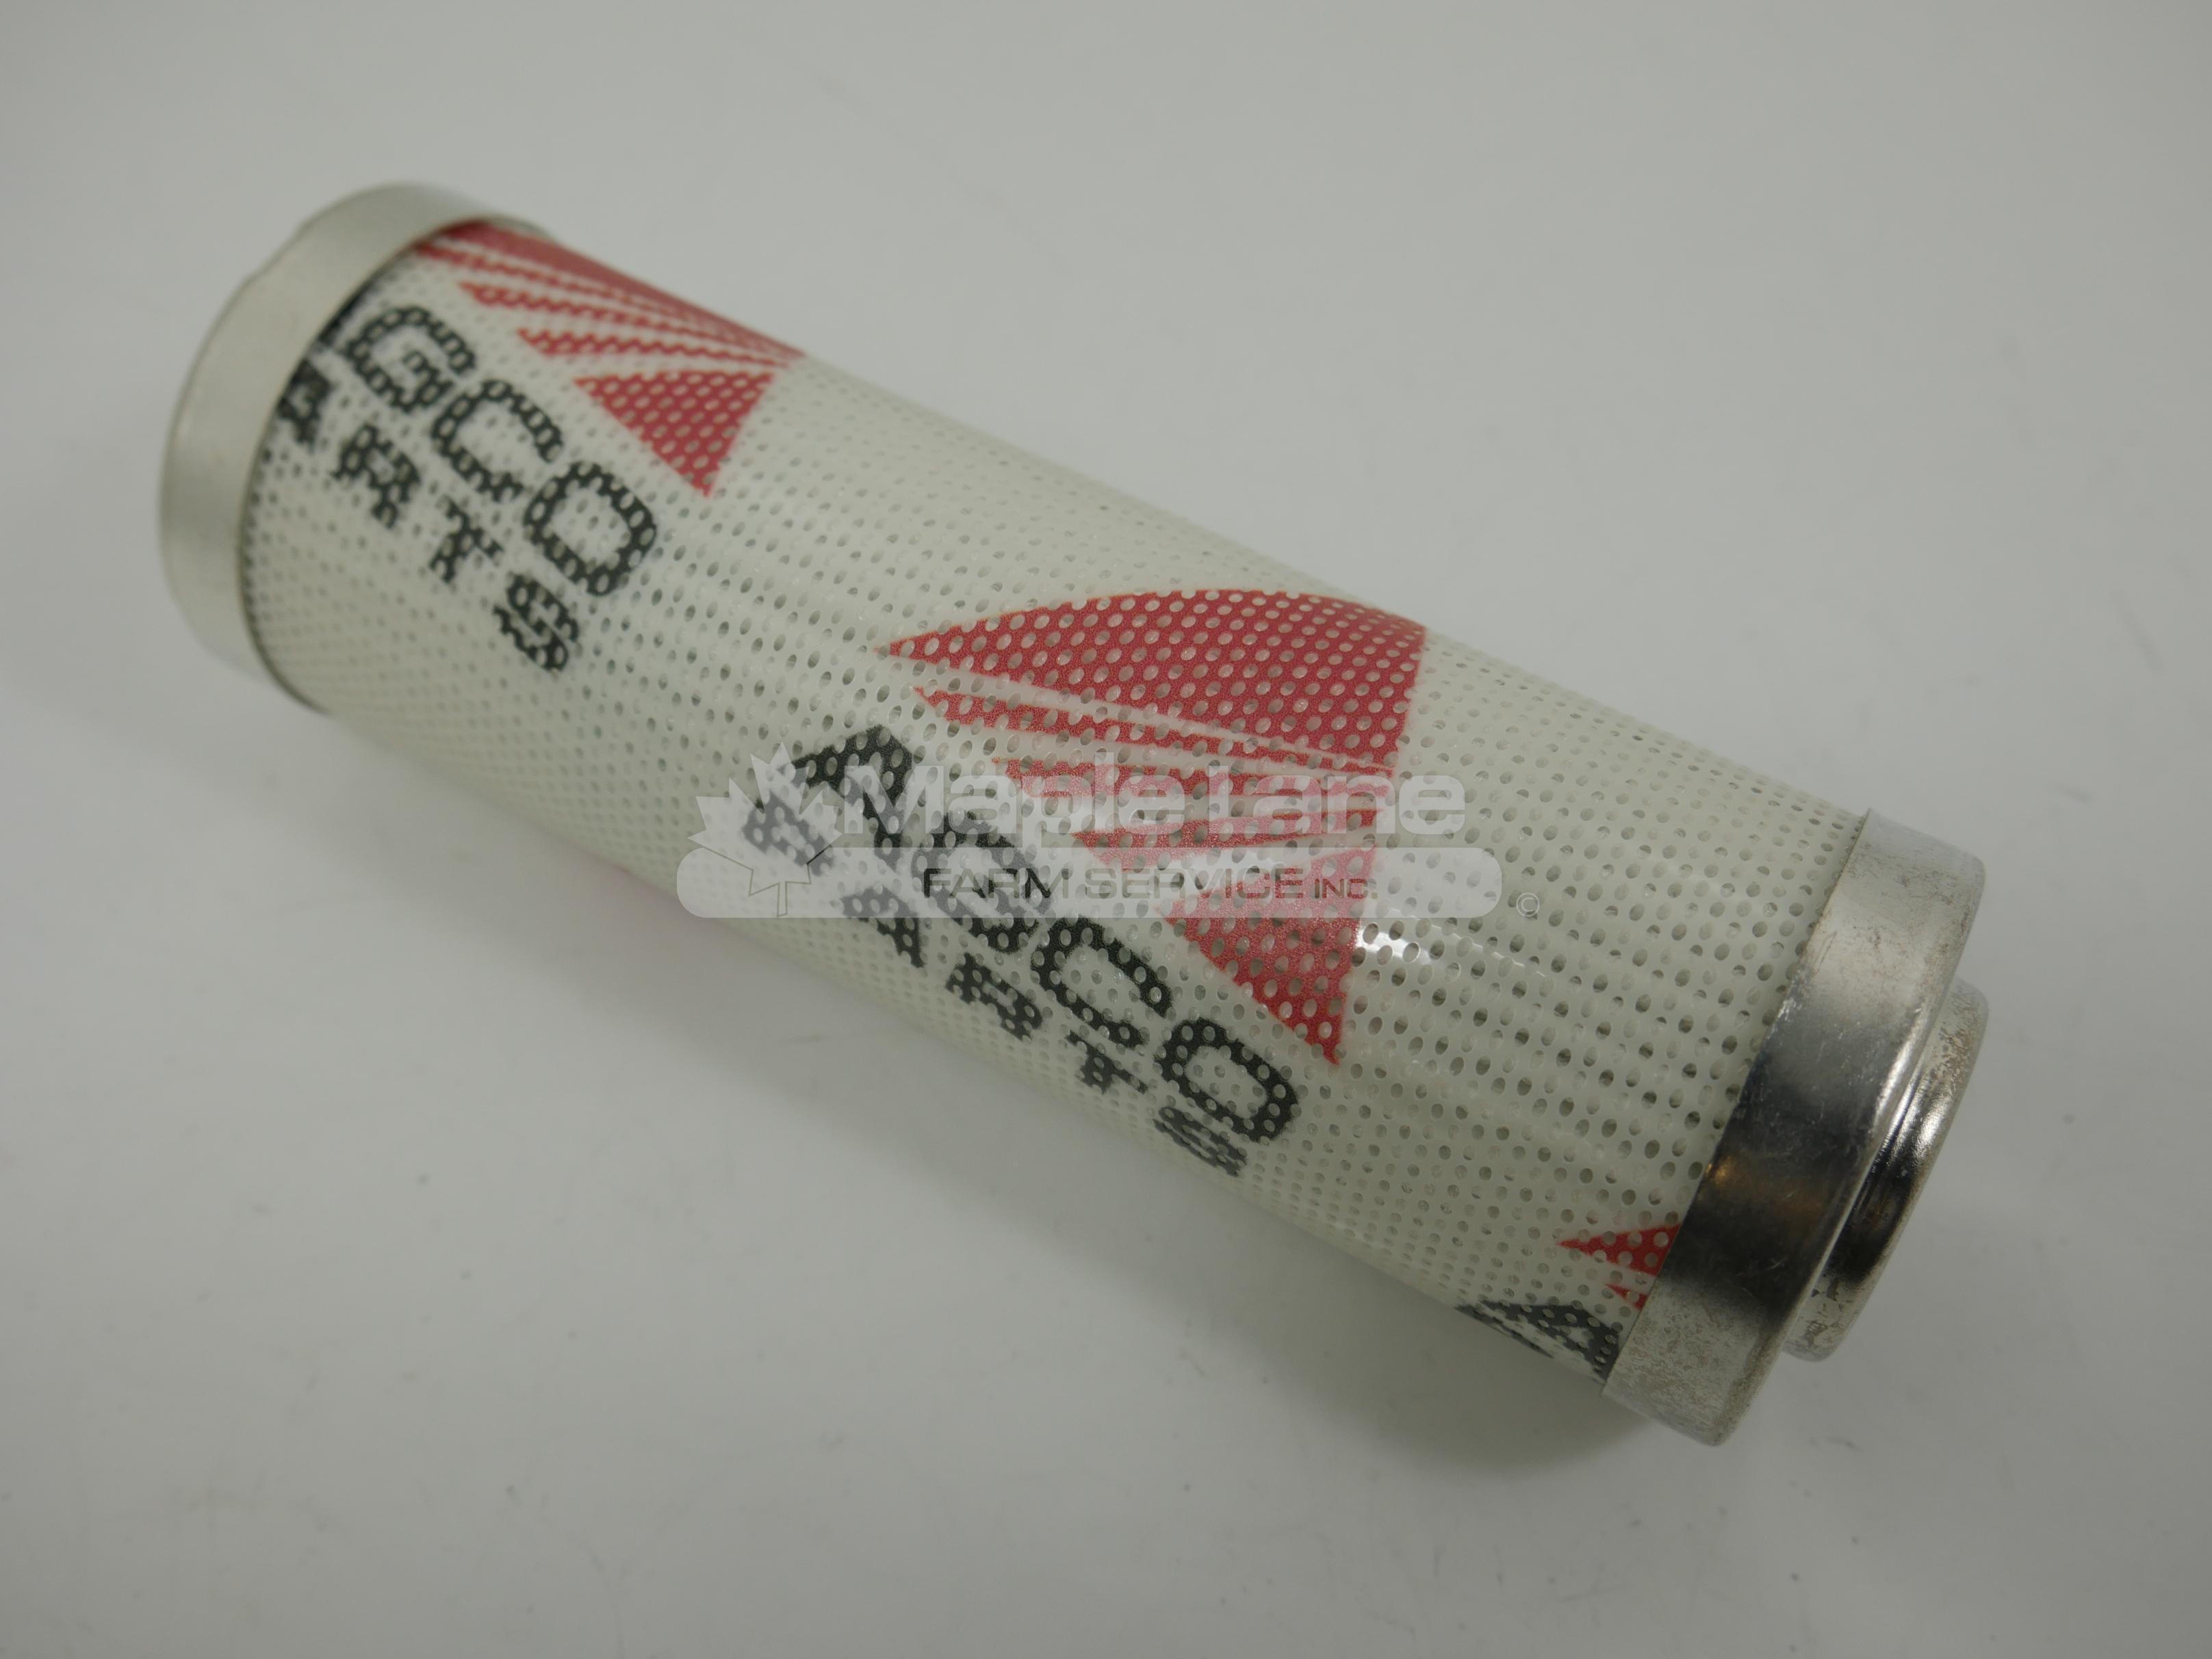 3619594M1 Filter Element